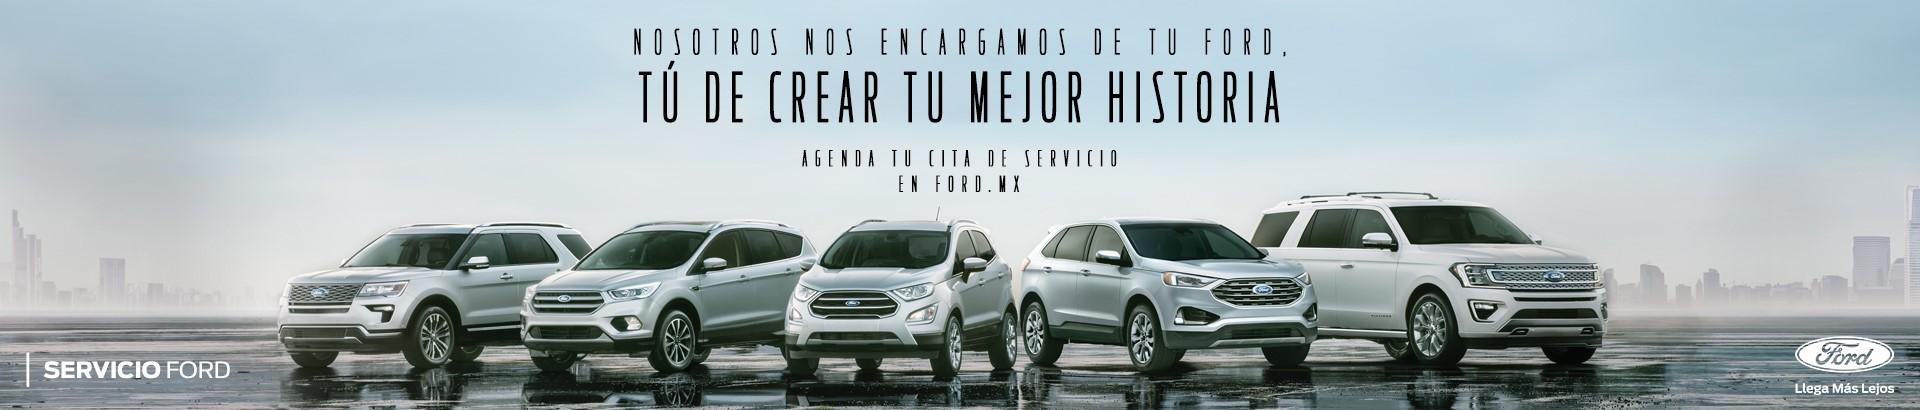 Ford Vista Hermosa